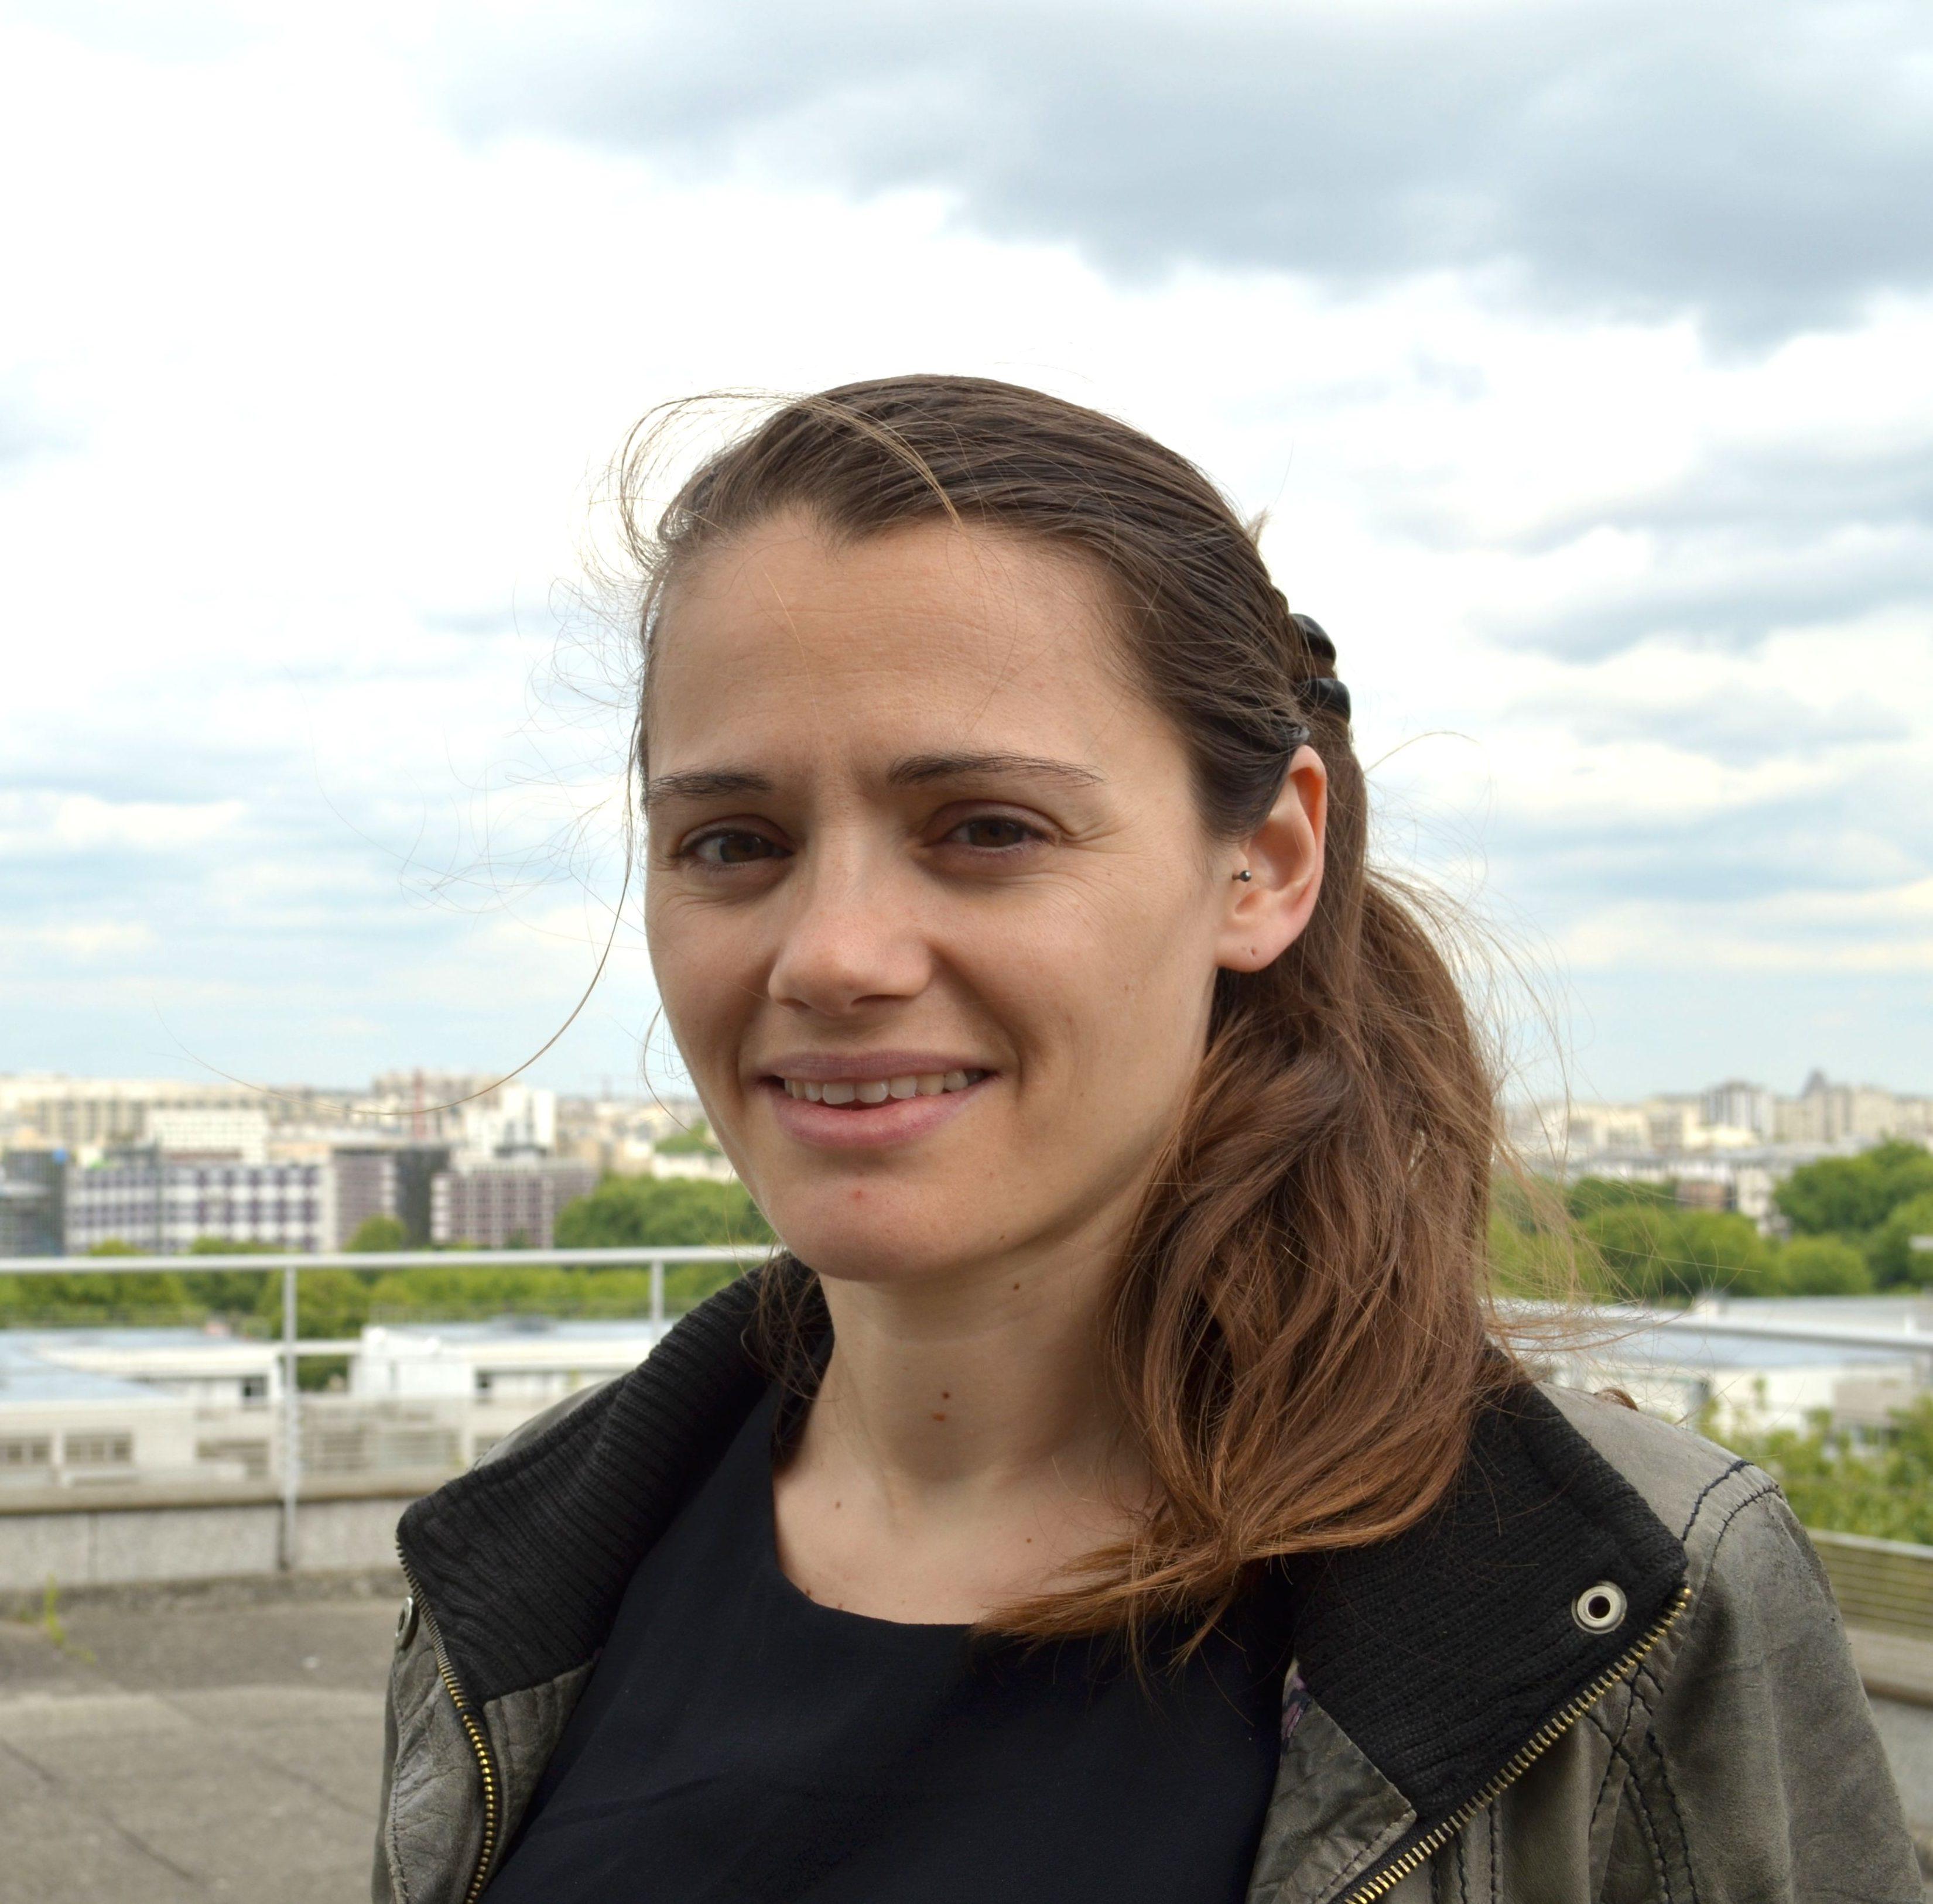 Stéphanie Barral